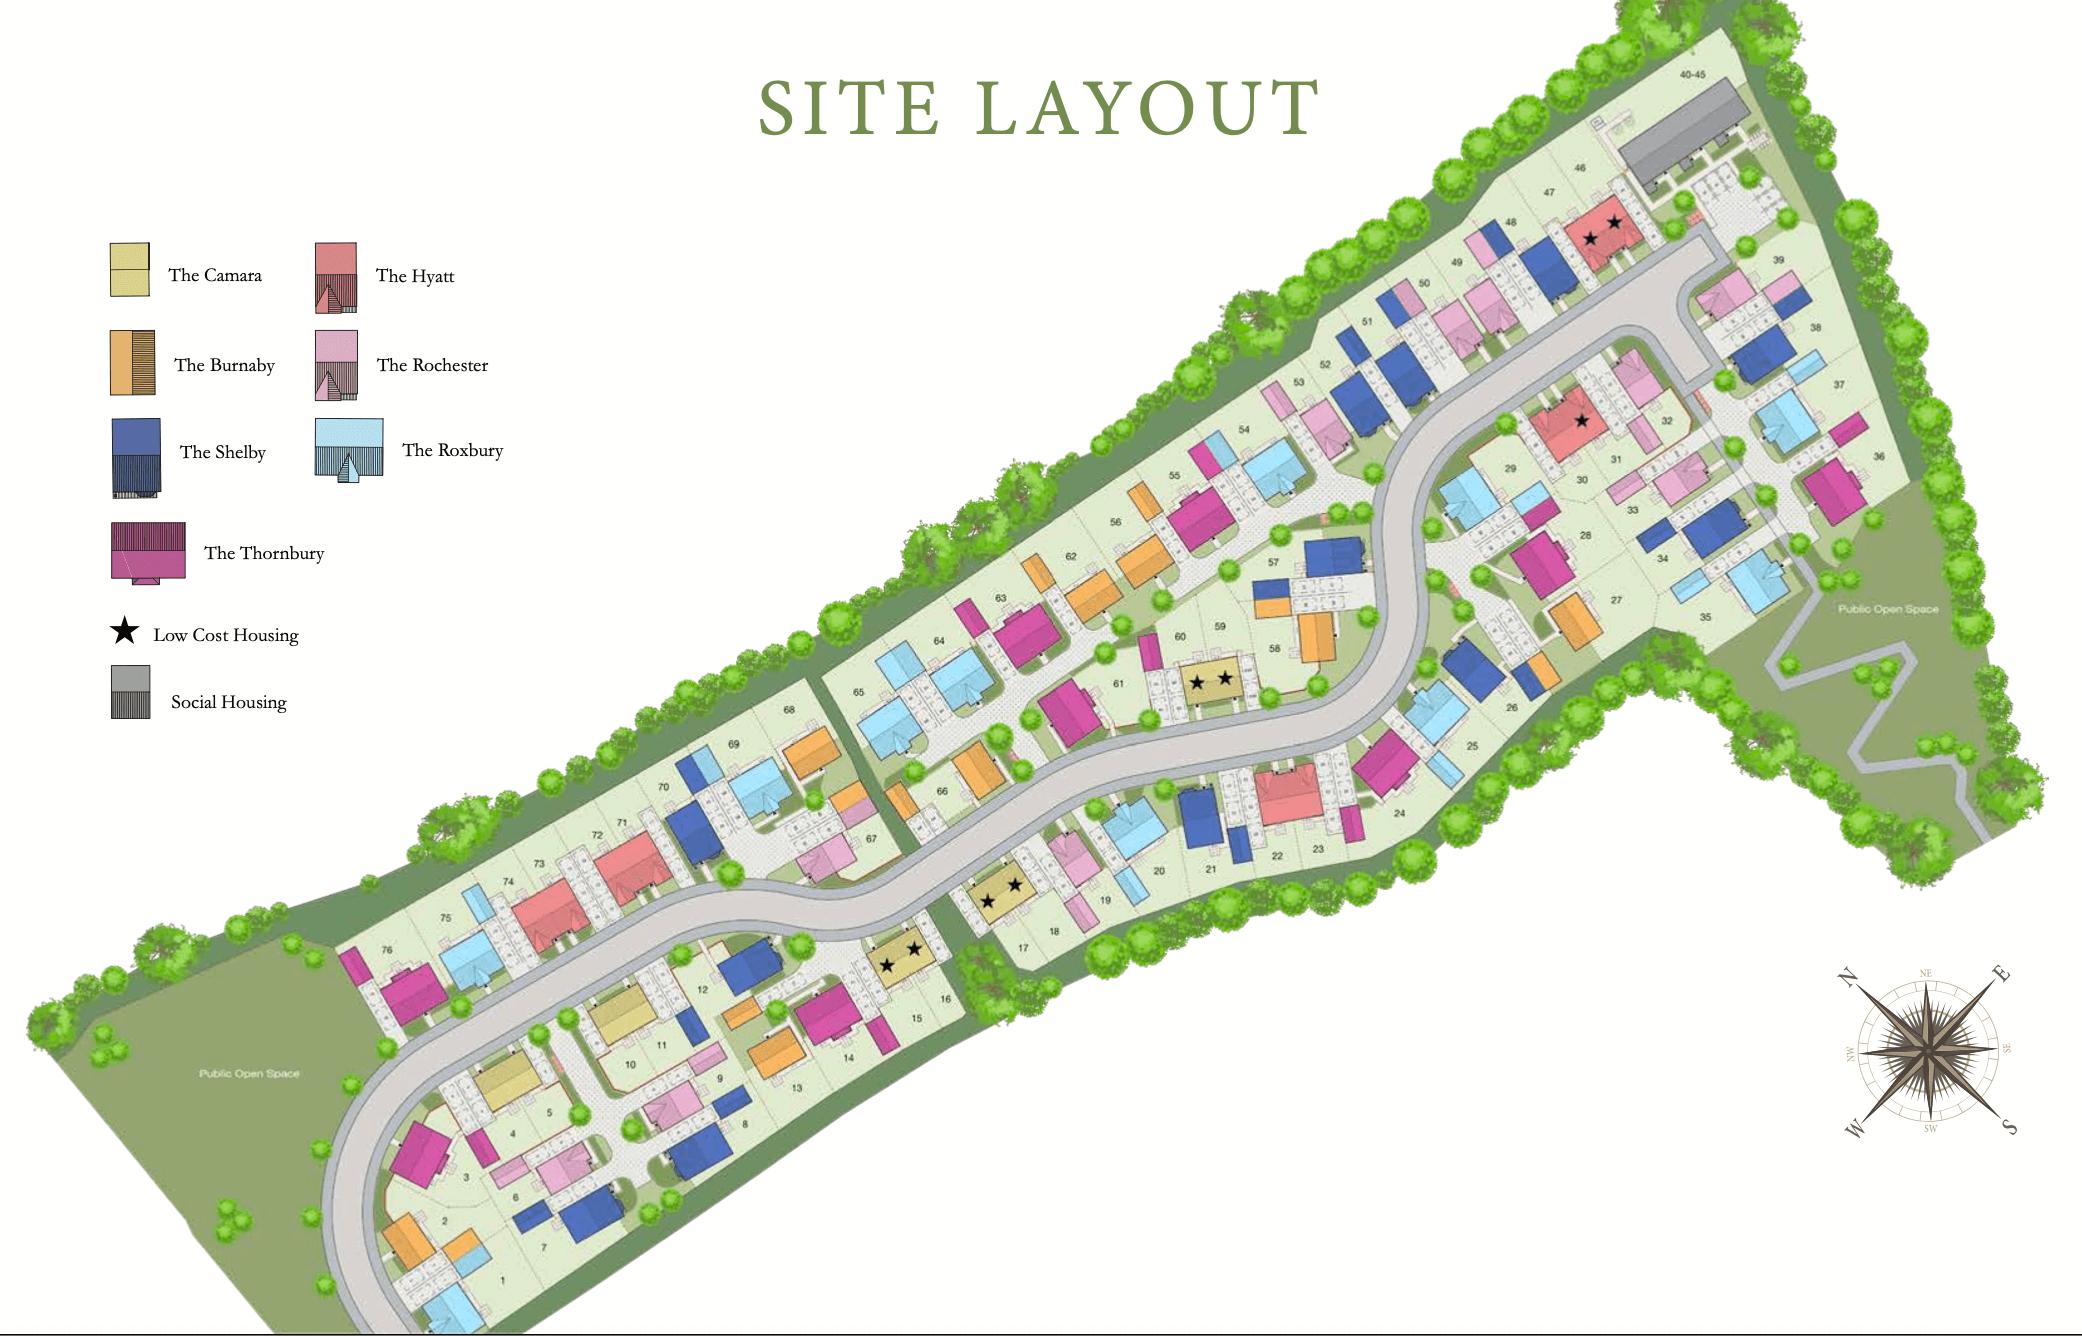 Woodlands Green Sitemap